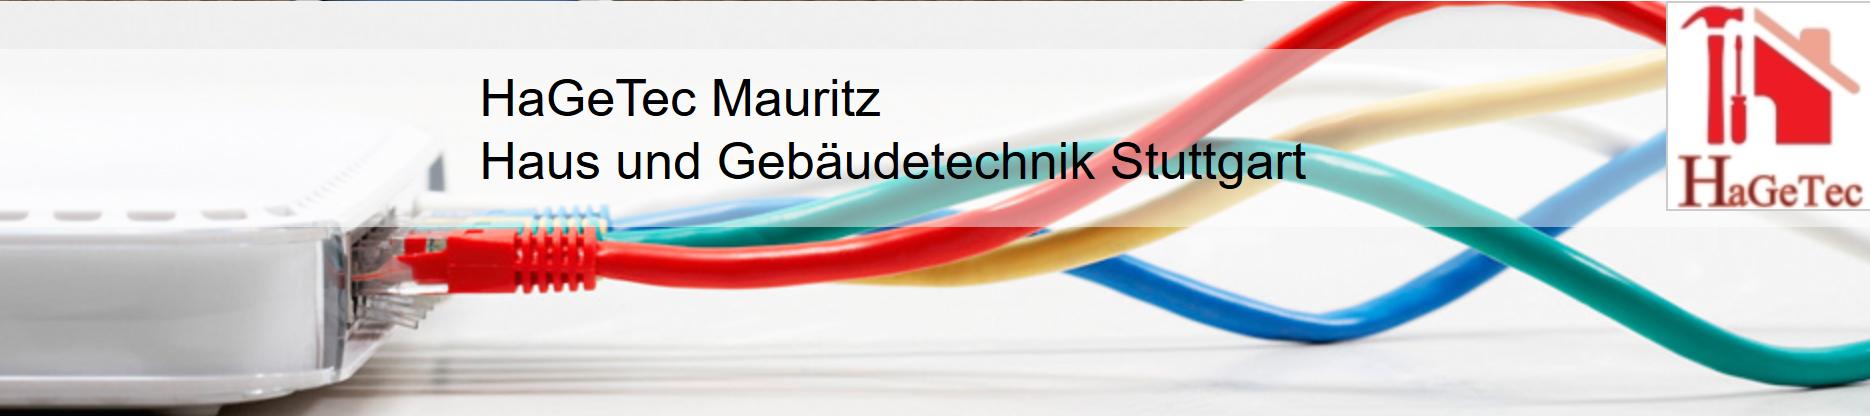 HaGeTex Mauritz